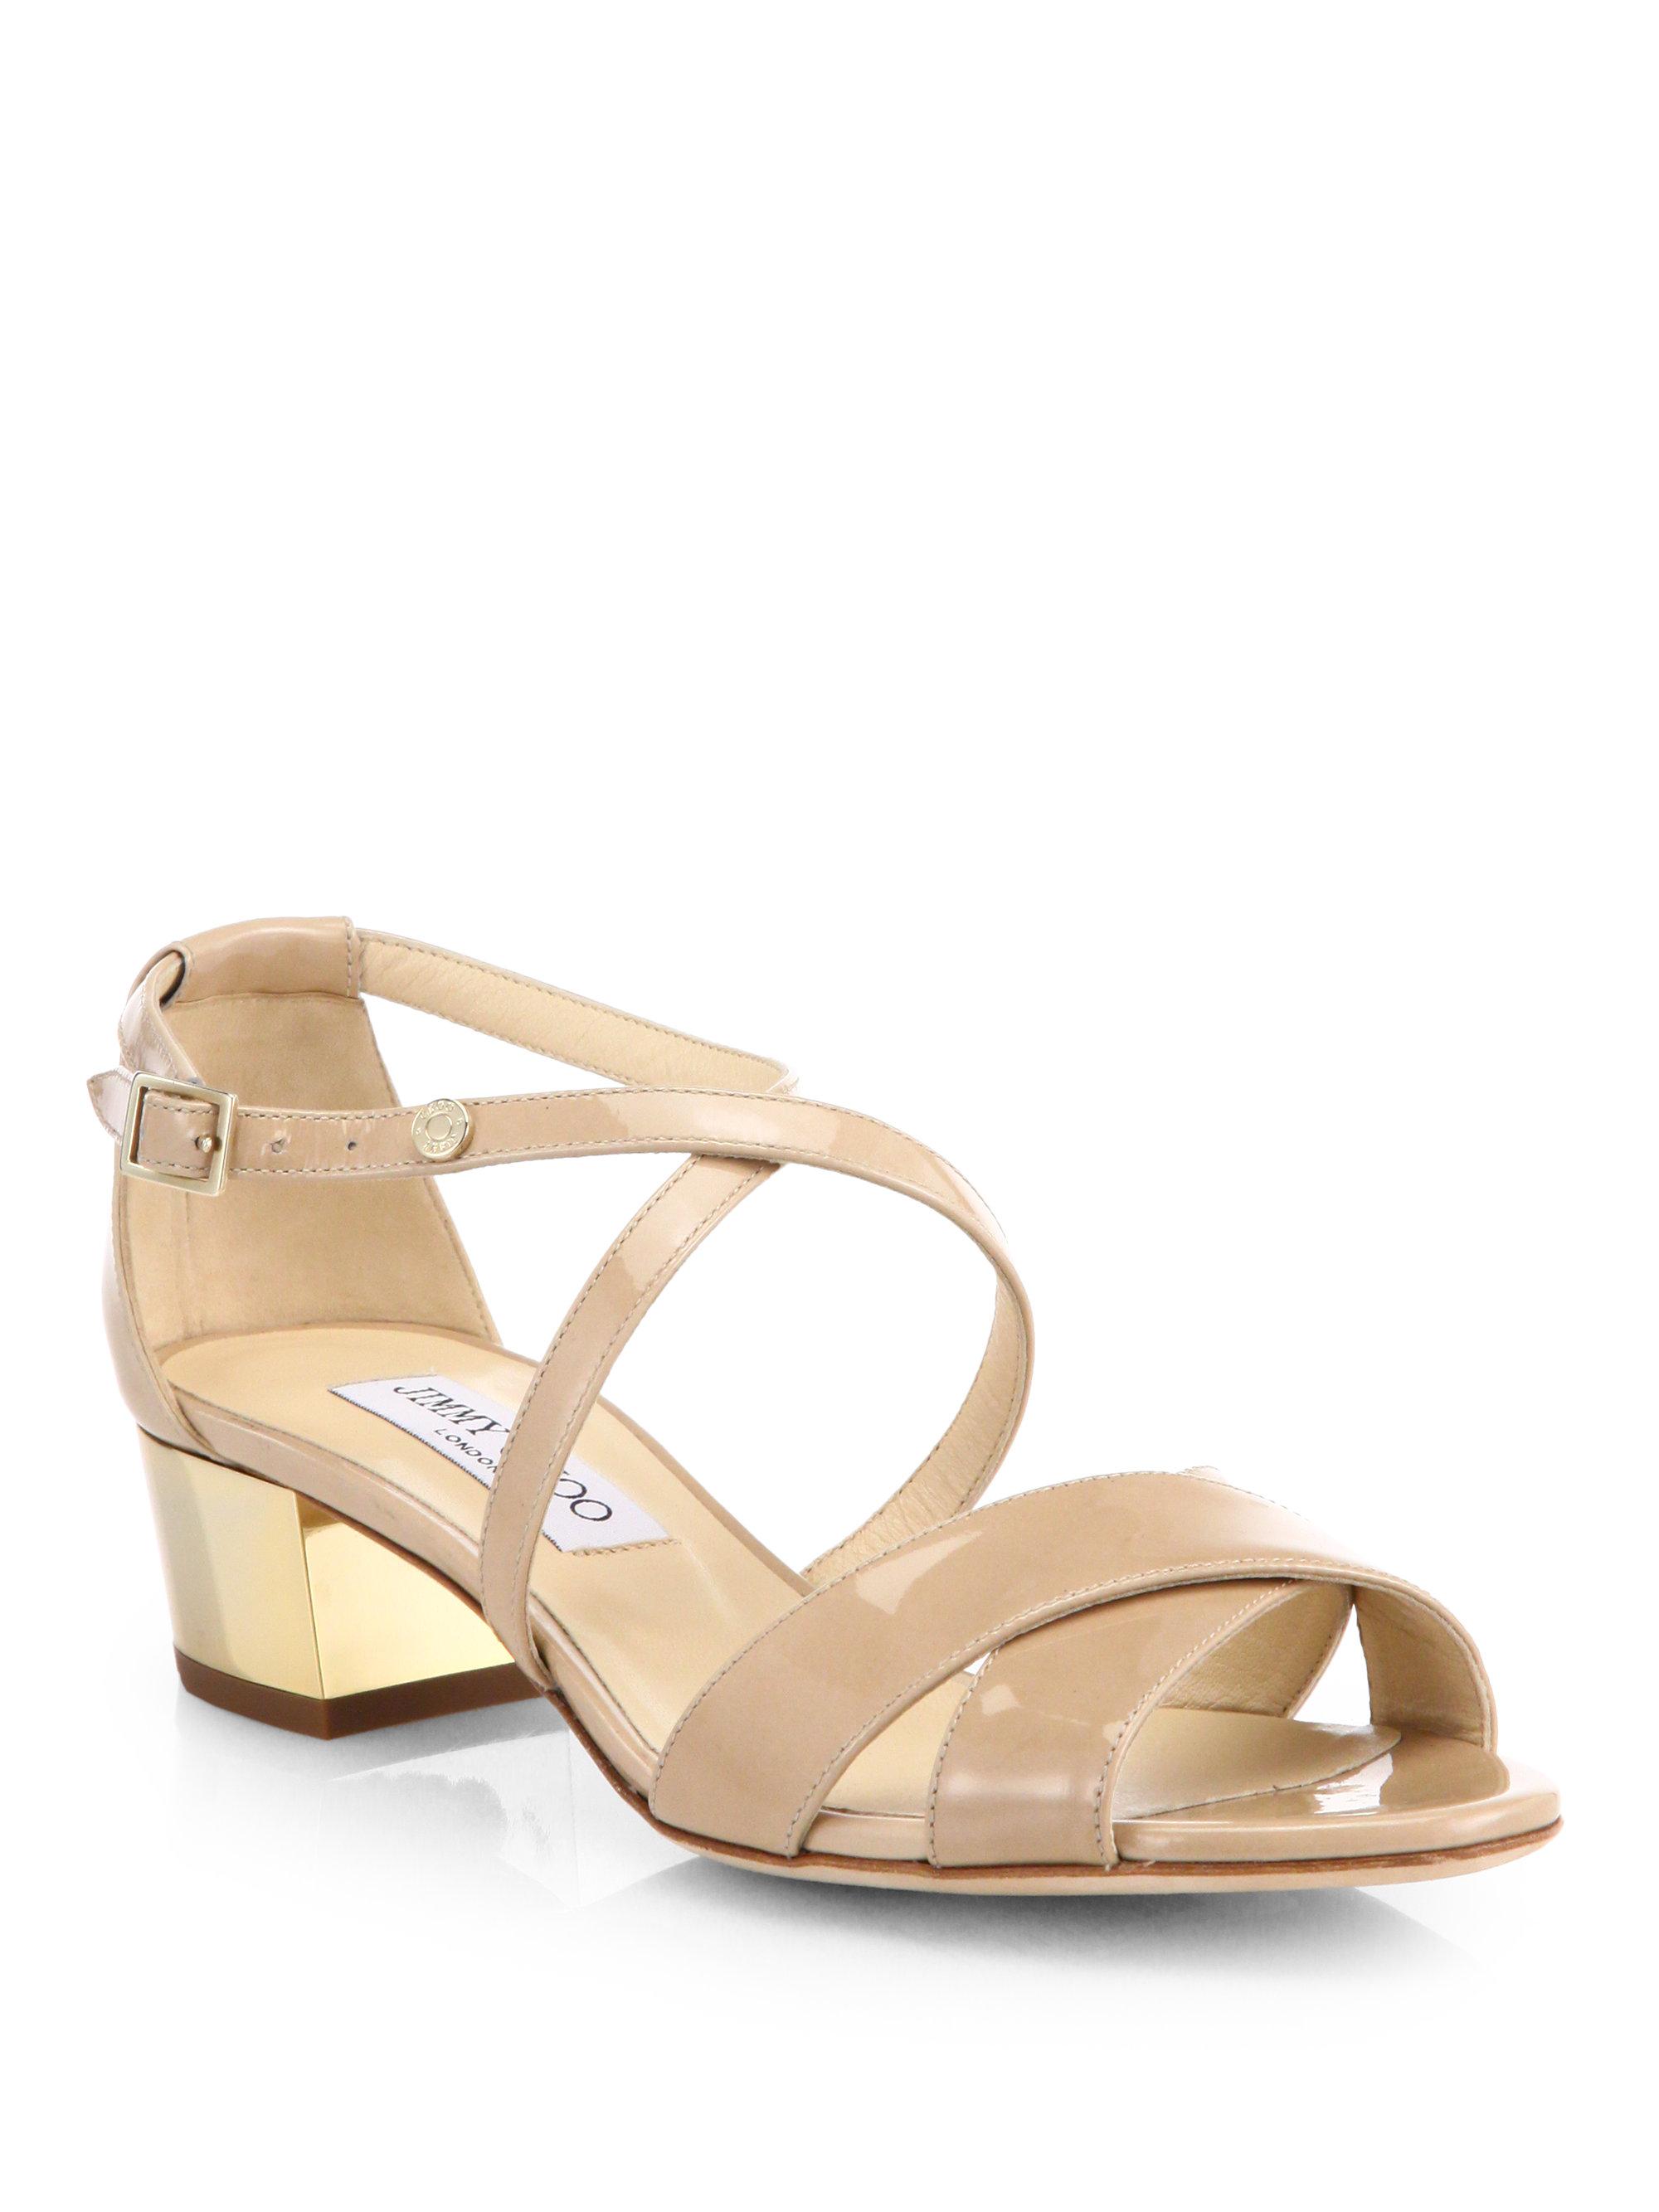 Jimmy Choo Merit Crisscross Patent Leather Sandals In